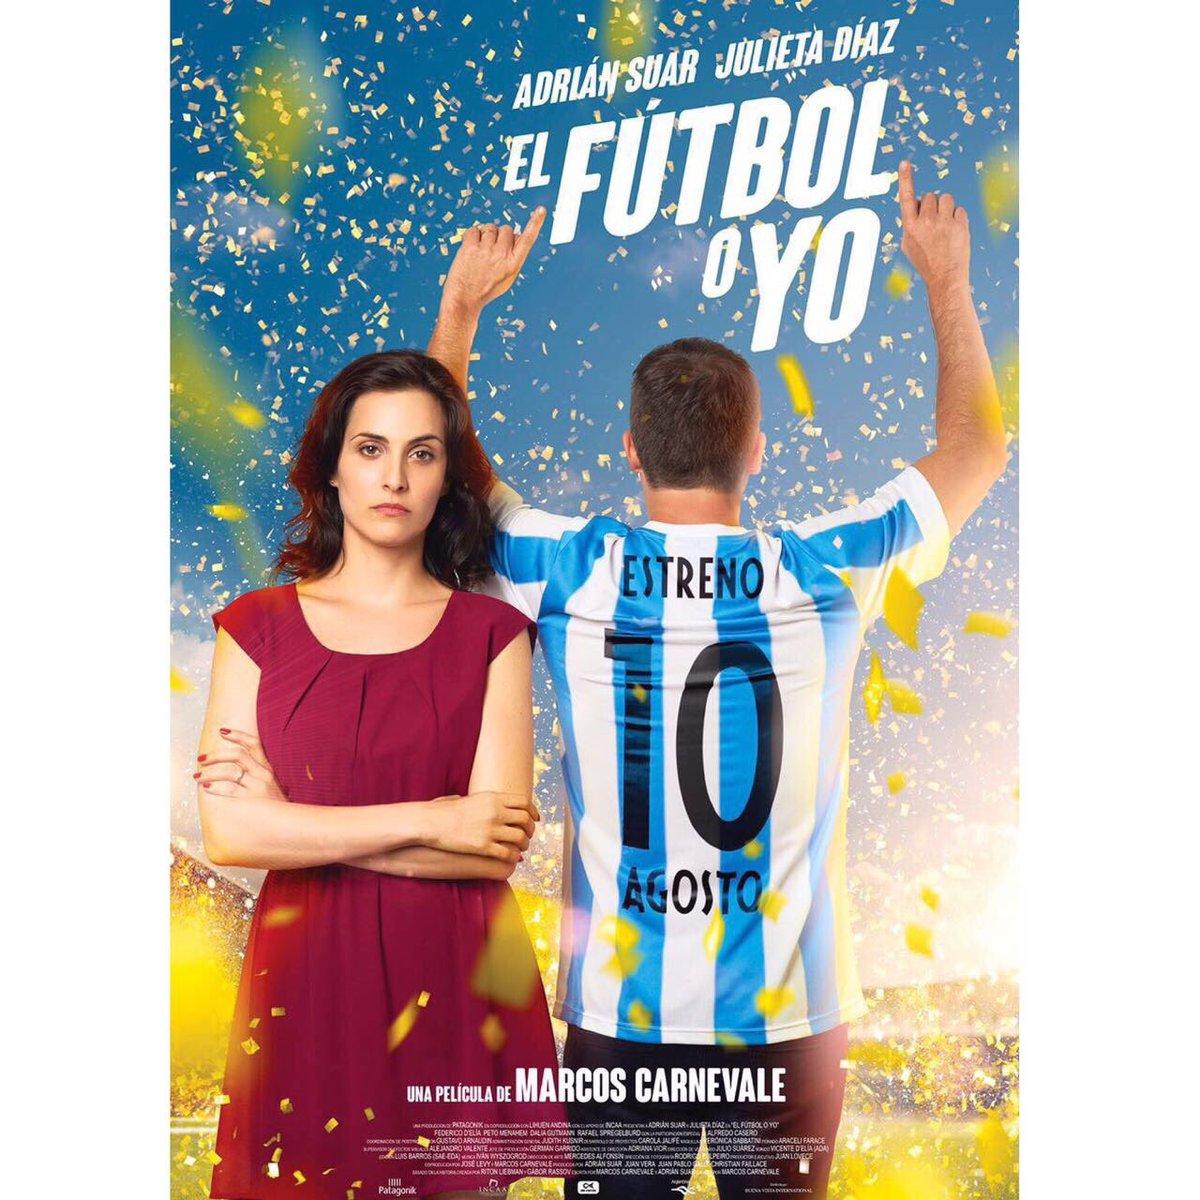 Ver El Futbol o YO Online (2017) Gratis HD Pelicula Argentina Completa